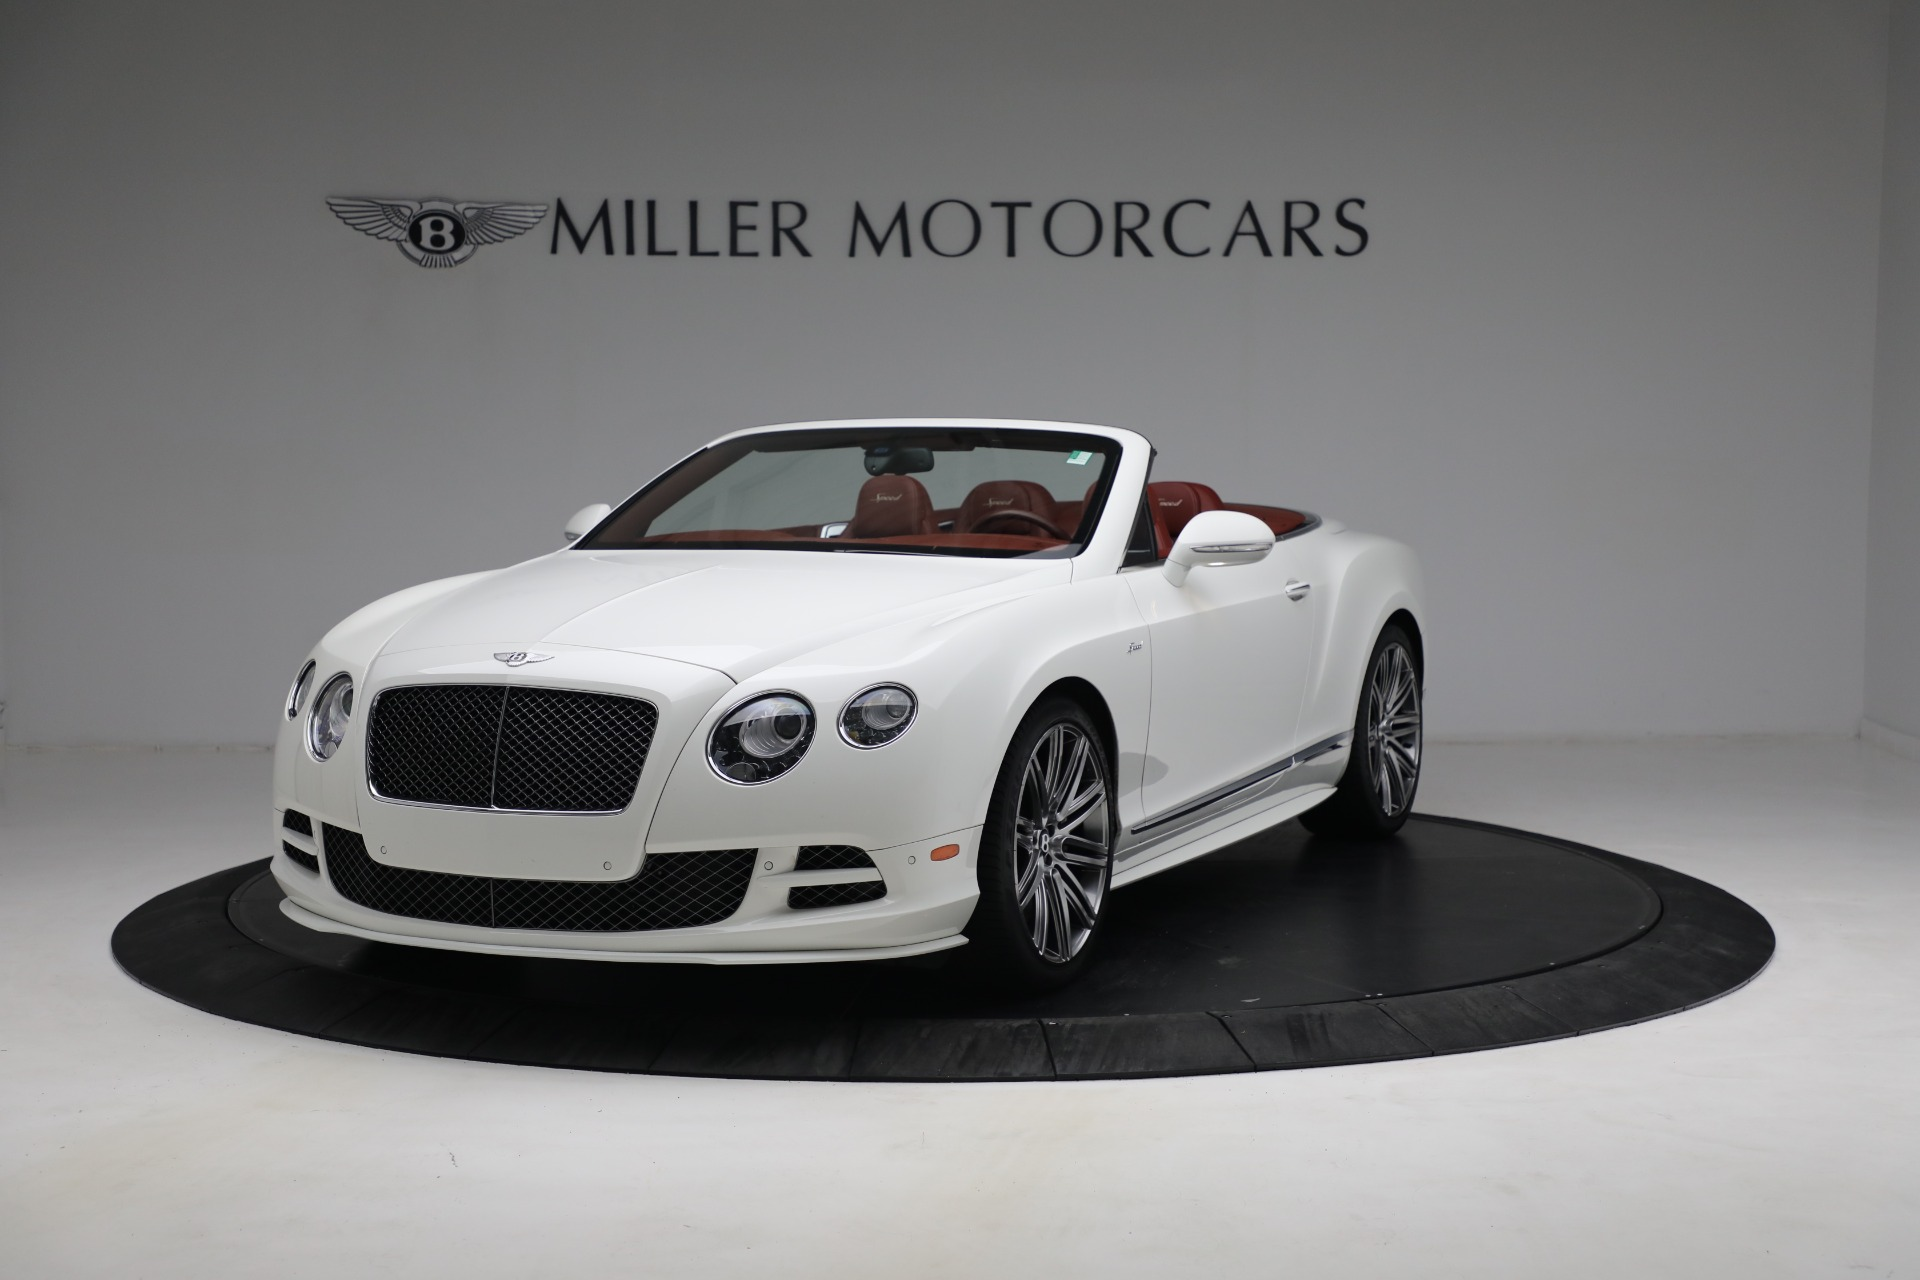 Used 2015 Bentley Continental GT Speed for sale $145,900 at Maserati of Westport in Westport CT 06880 1